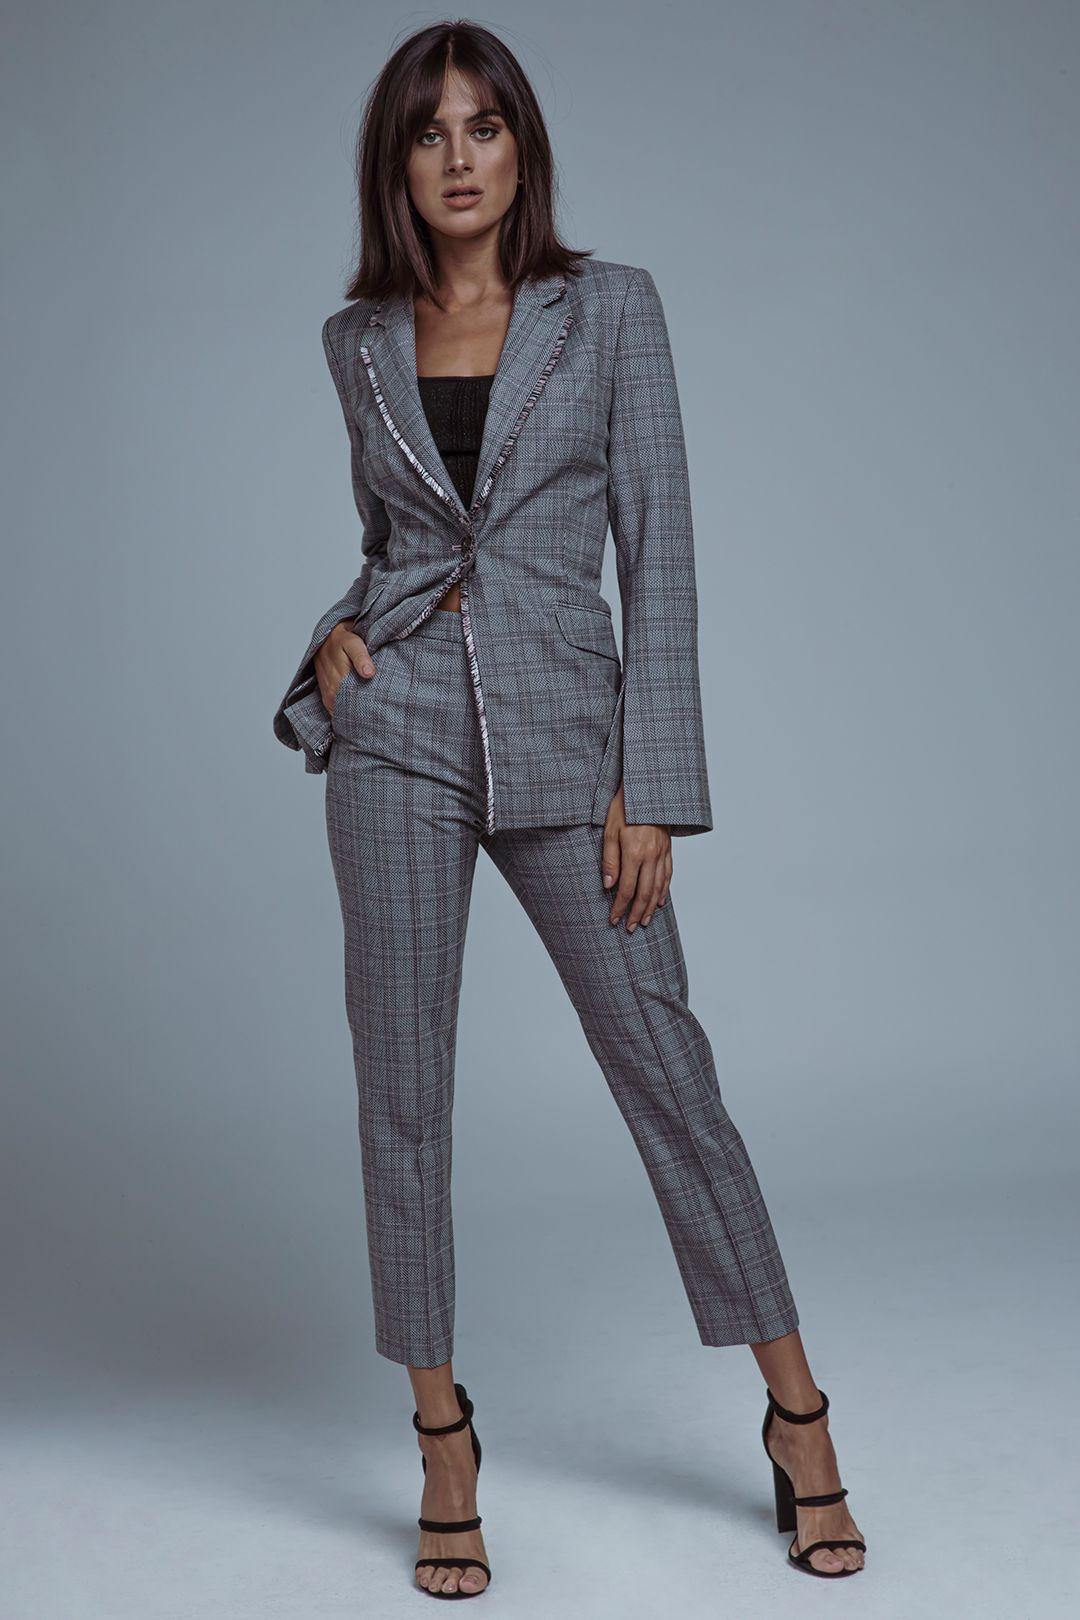 rebecca-vallance-margot-blazer-and-slim-pant-set-grey-check-campaign